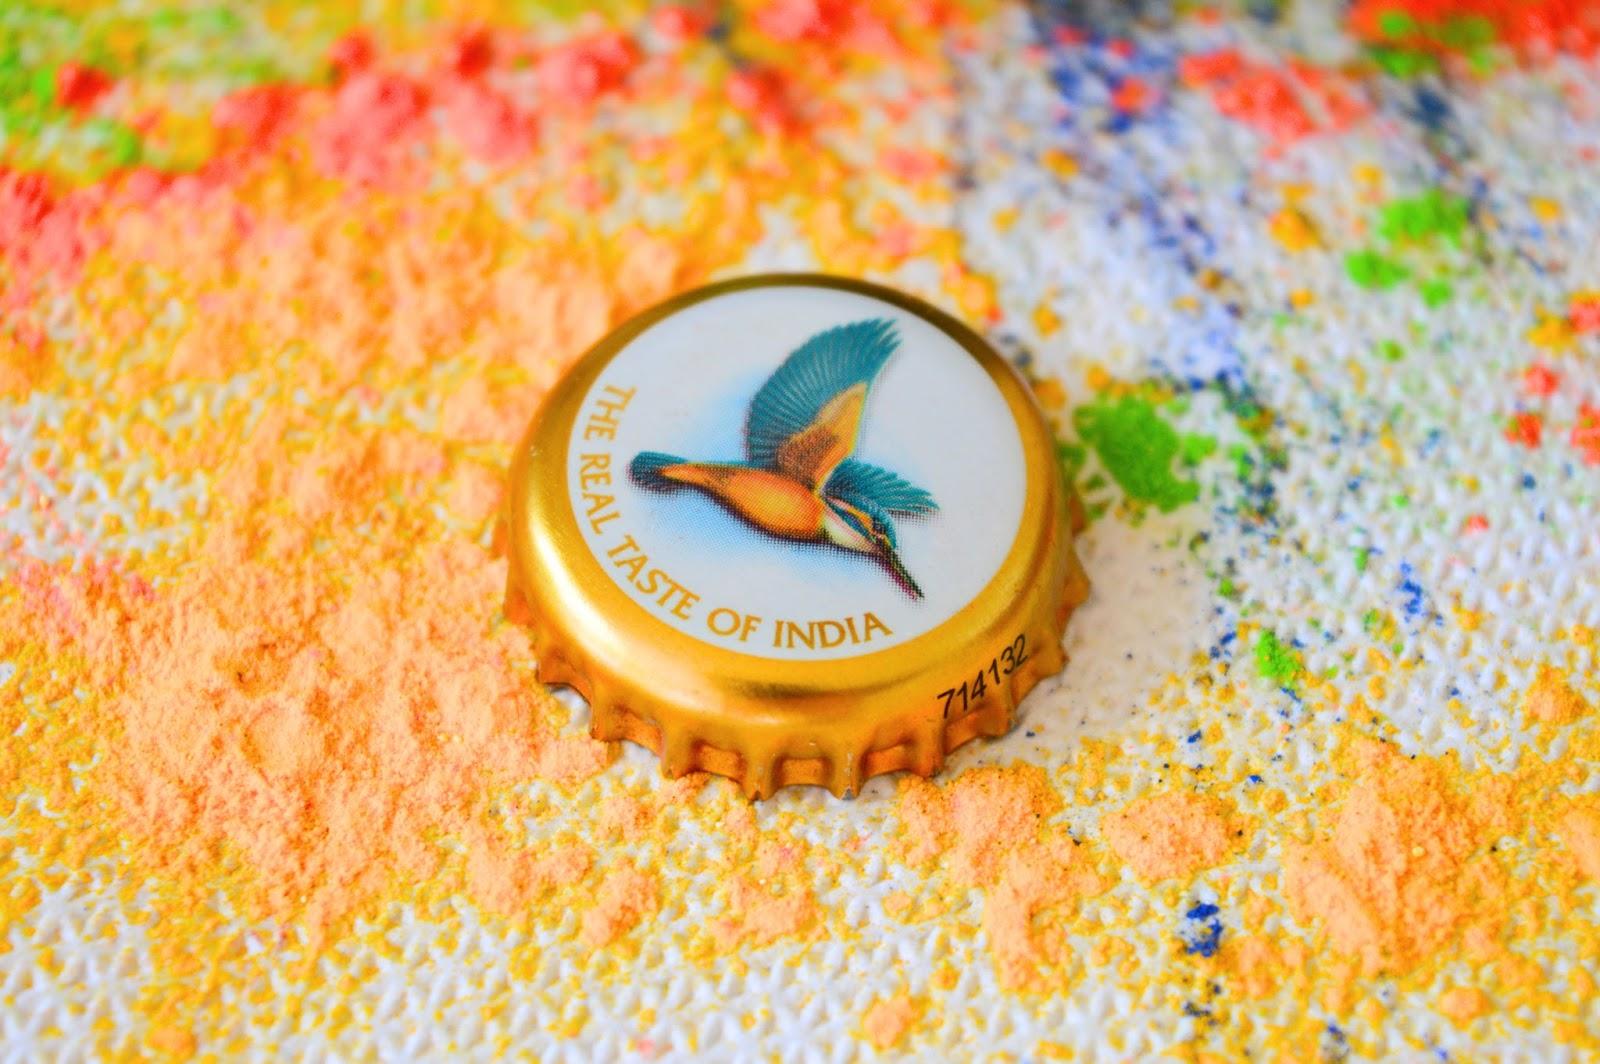 Kingfisher beer, Holi festival recipes, food bloggers, food blog